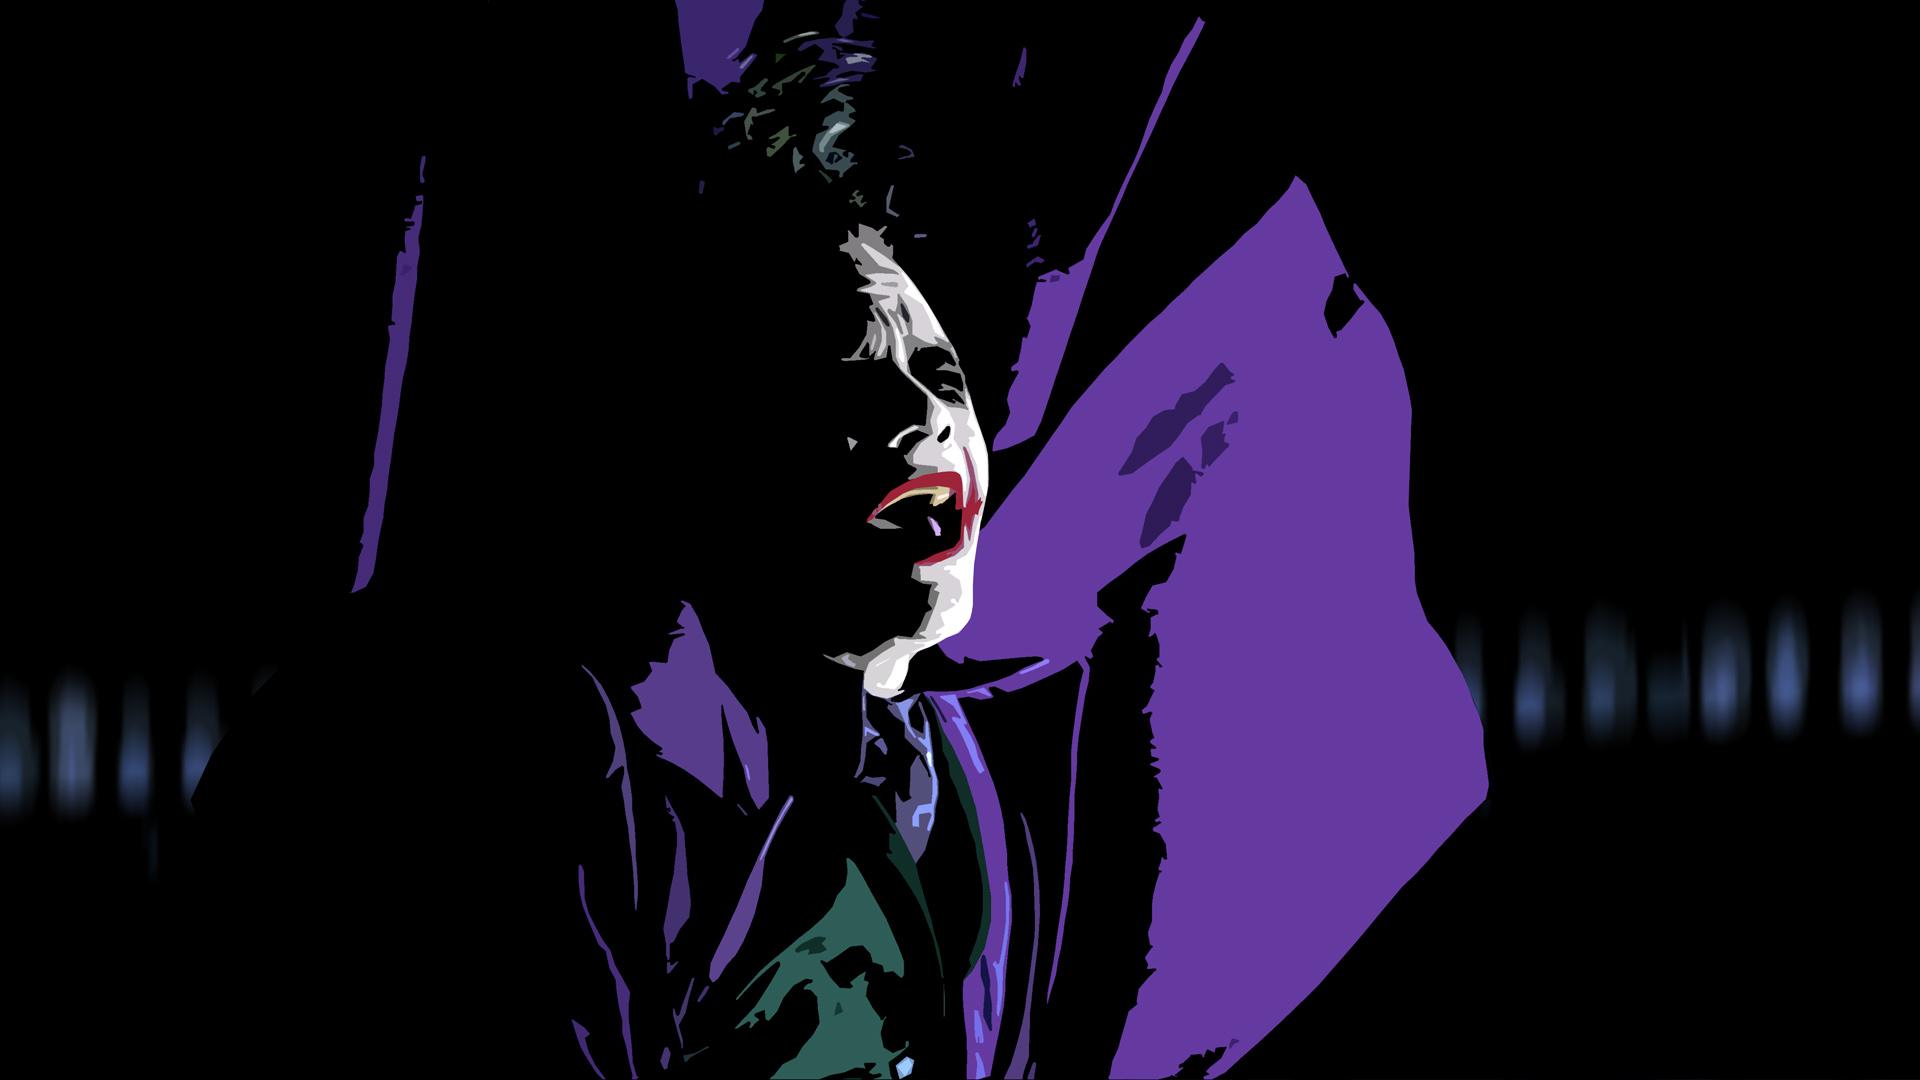 Joker wallpaper hd 1080p Animated Desktop Wallpapers 1920x1080